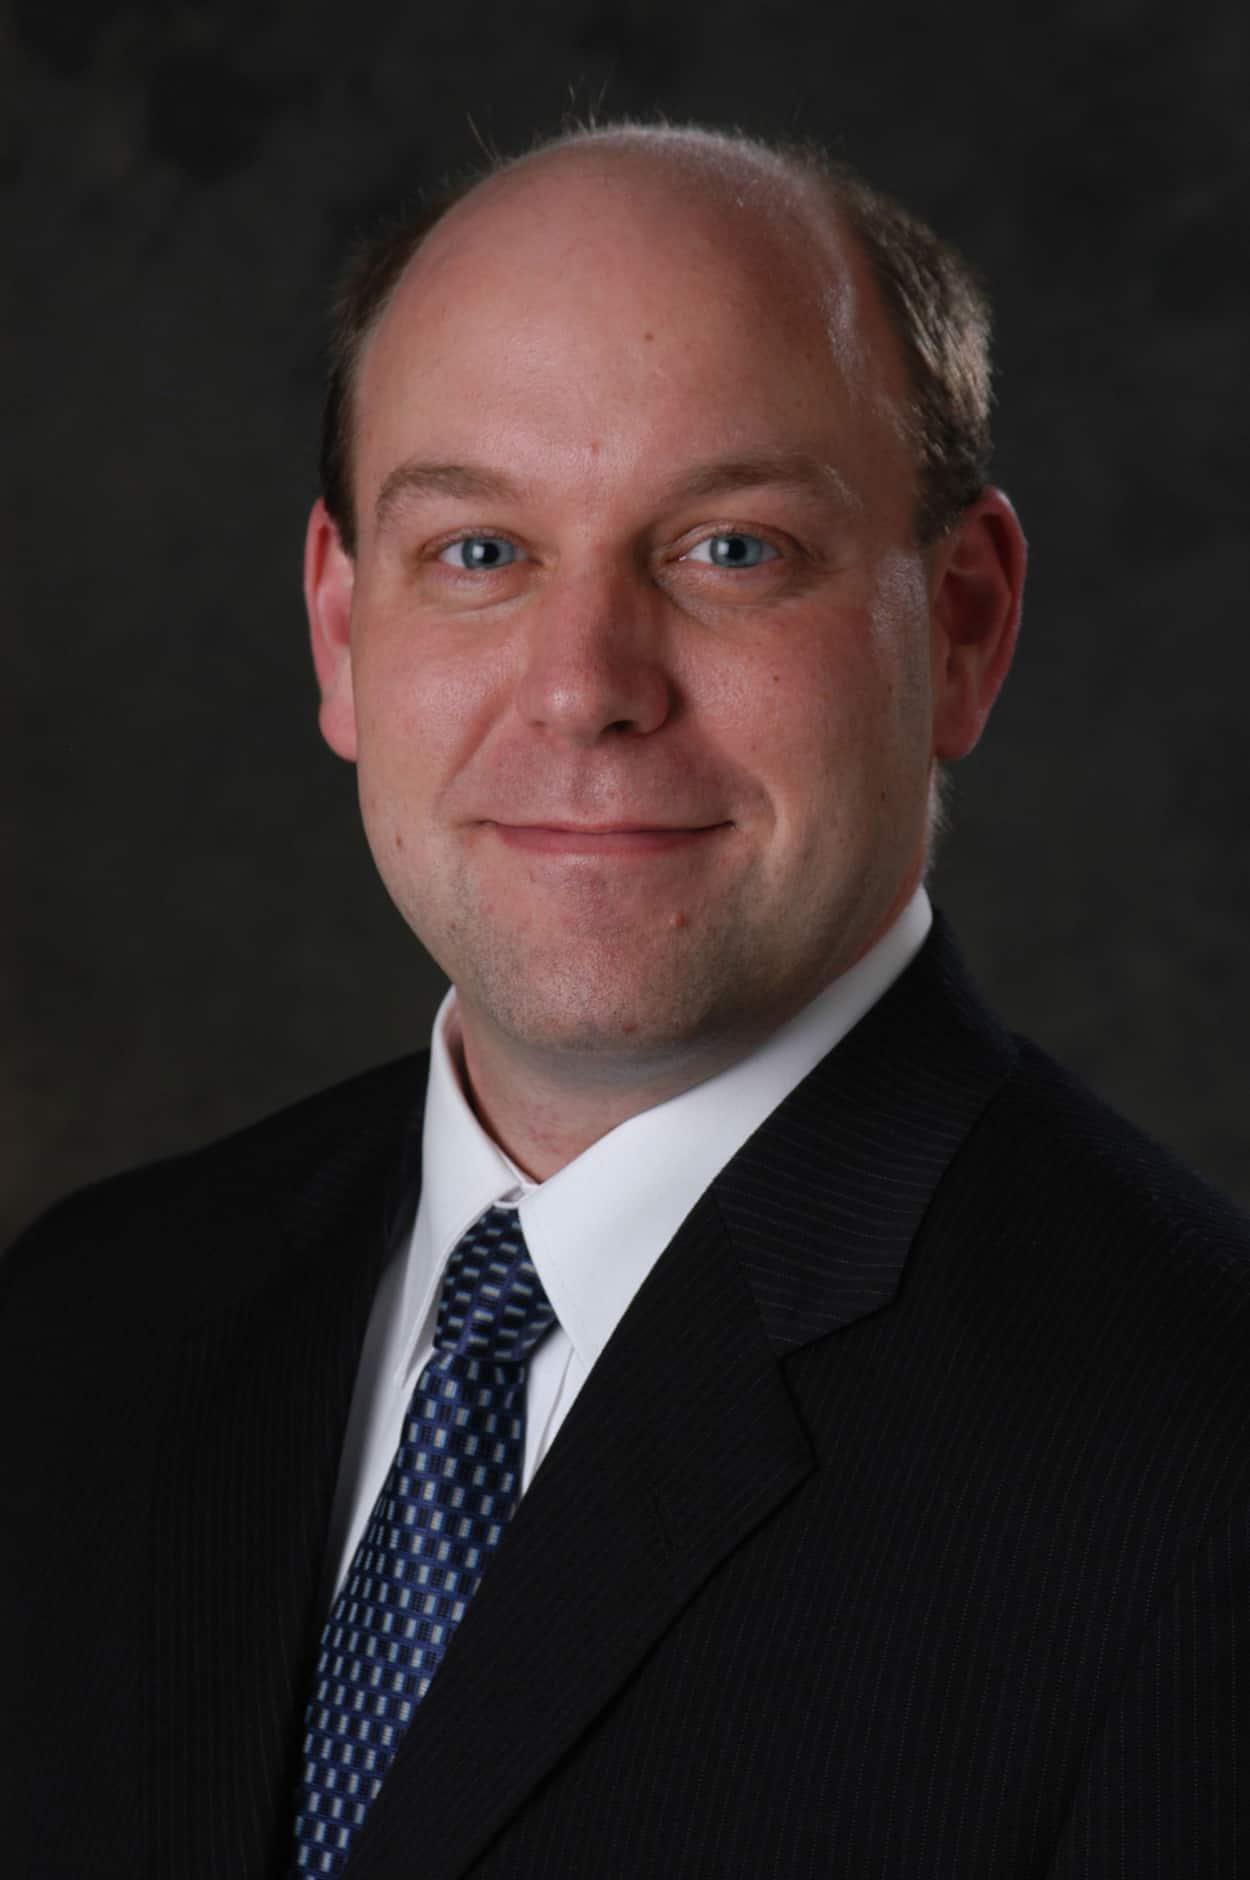 Kurt Luebbering